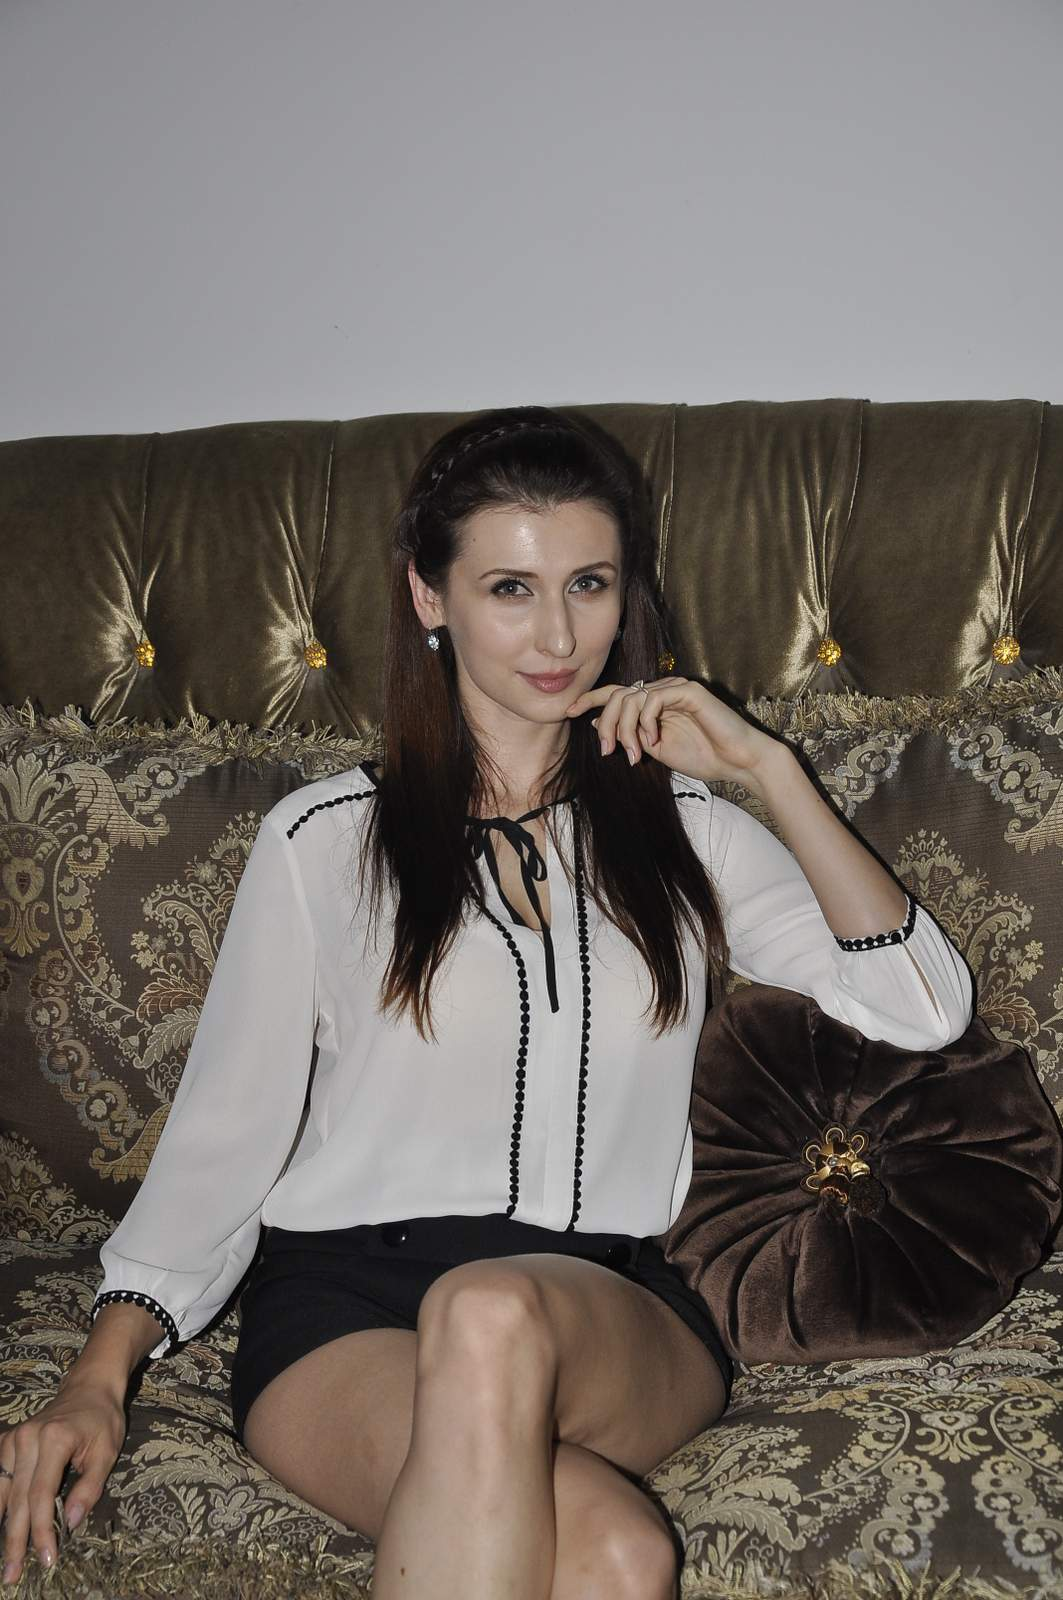 Claudia Ciesla nudes (24 photo), pics Paparazzi, iCloud, see through 2020